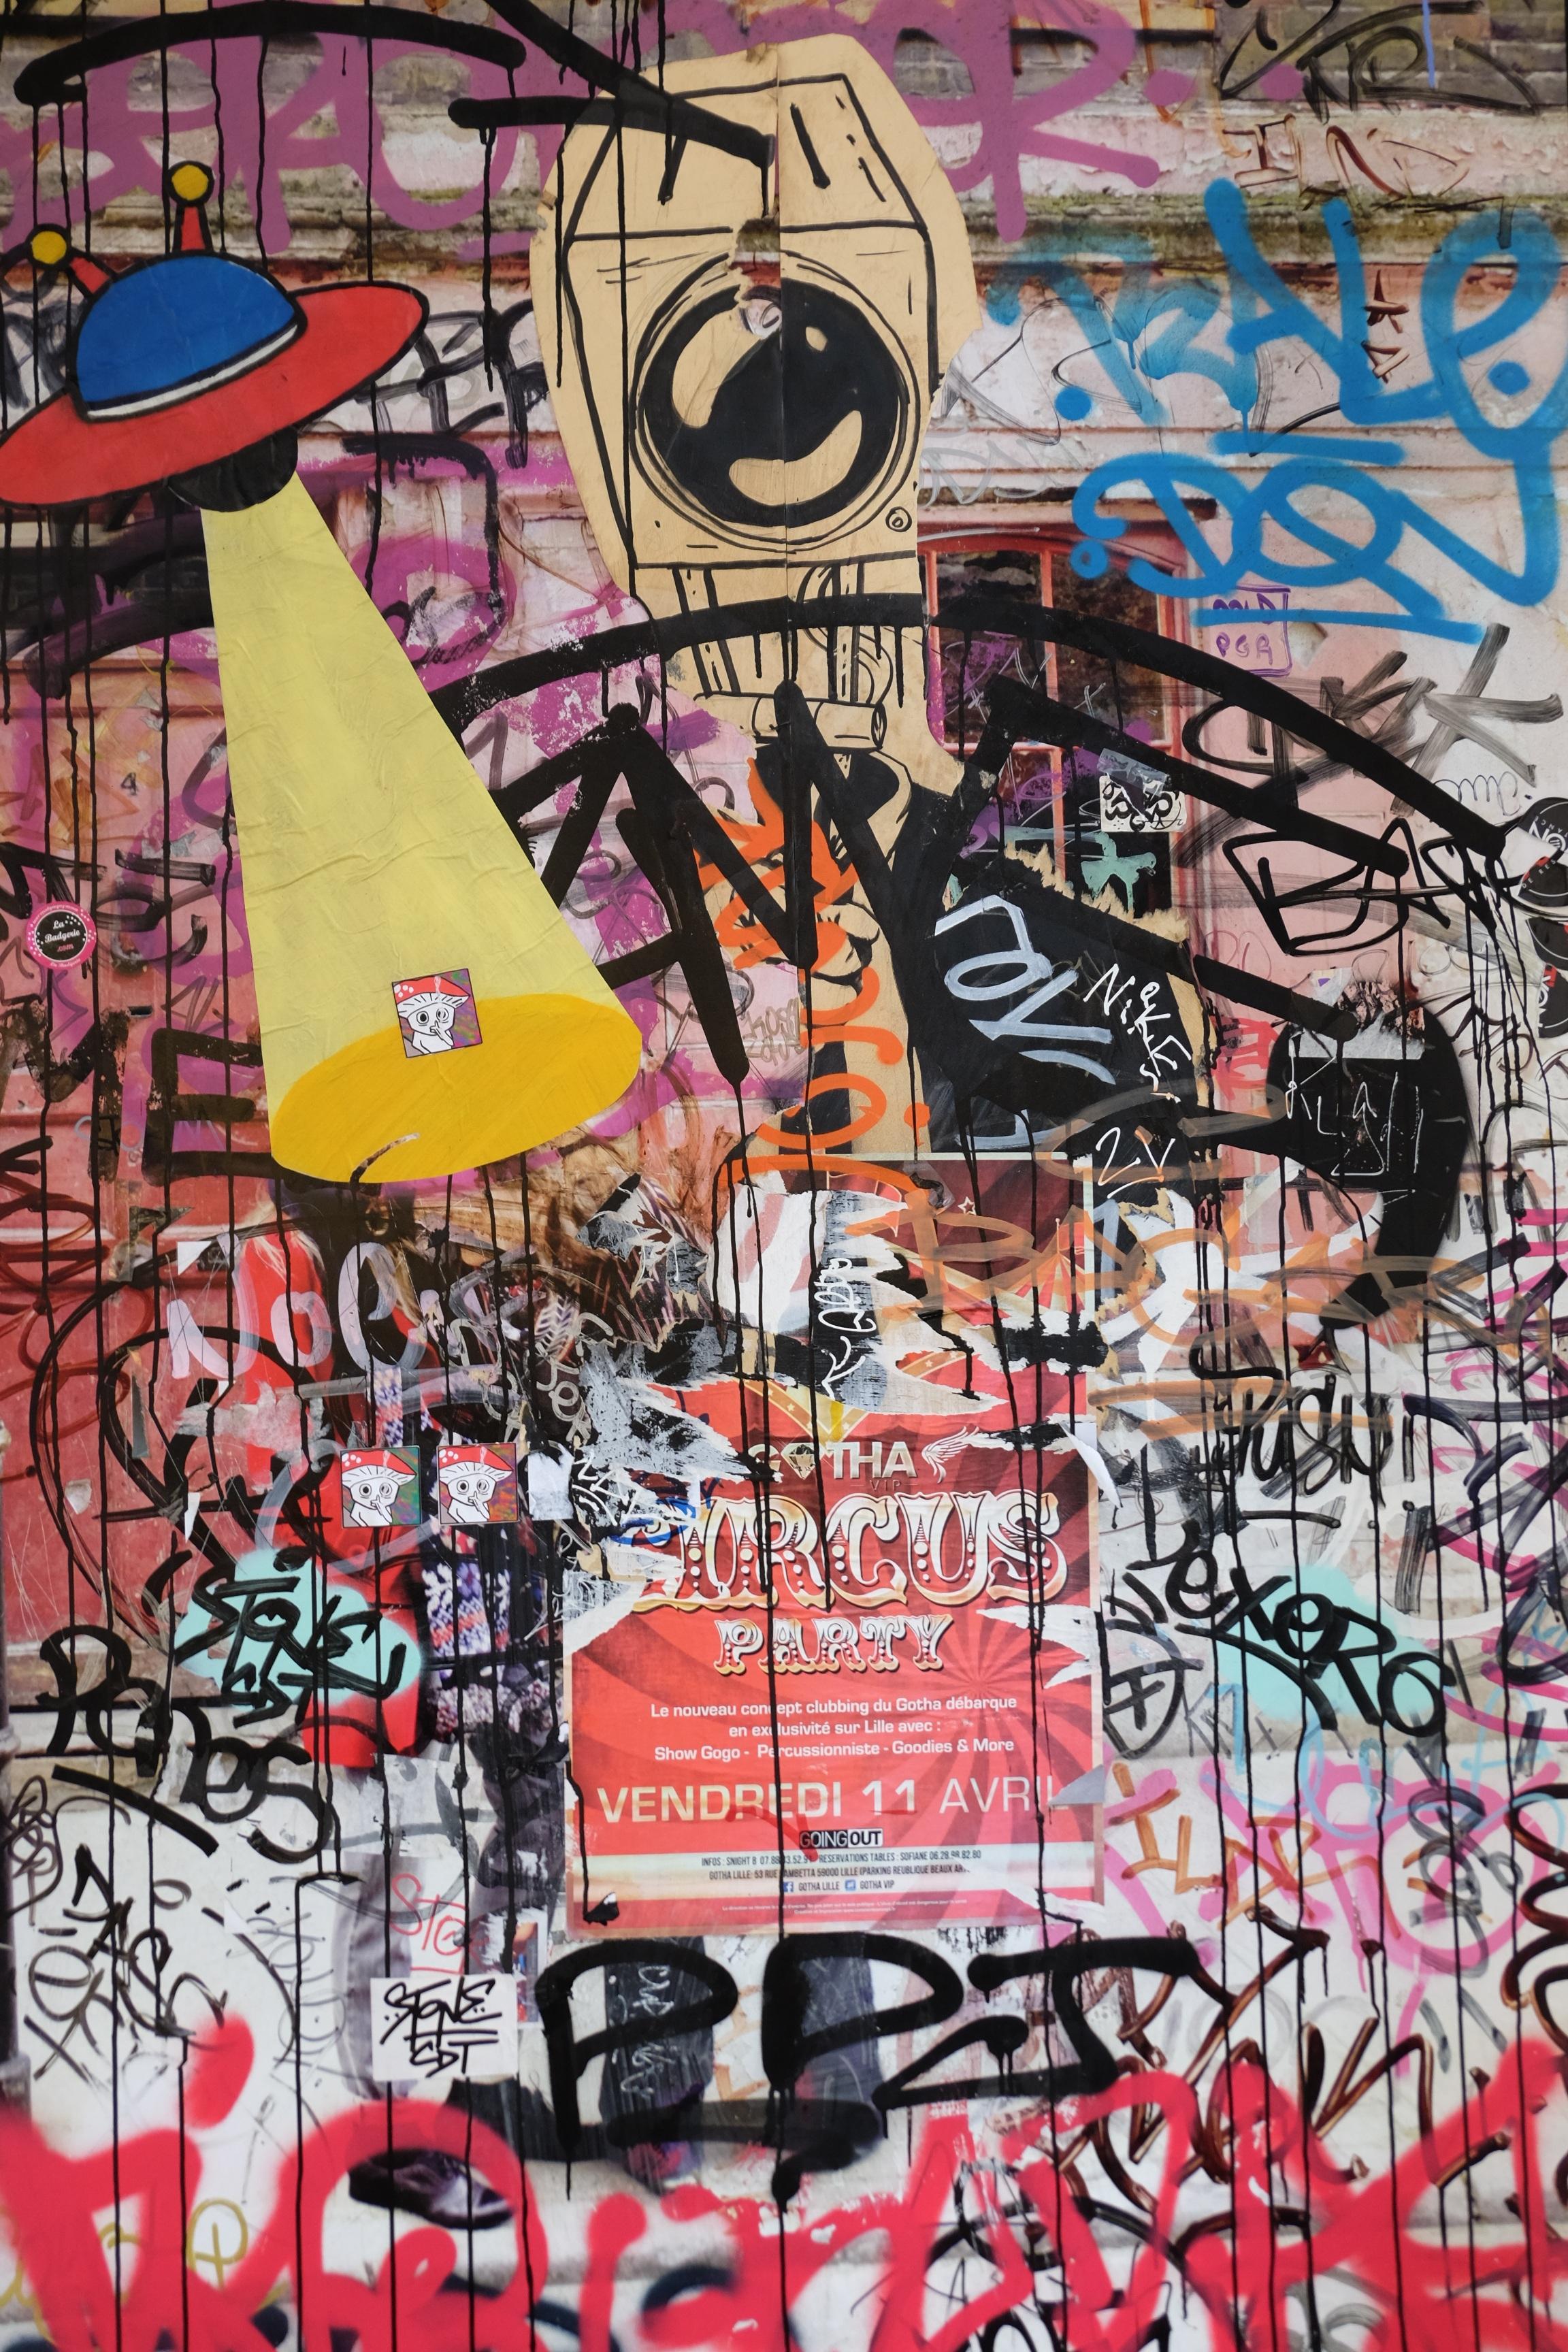 Images Gratuites : graffiti, art de rue, illustration, collage ...